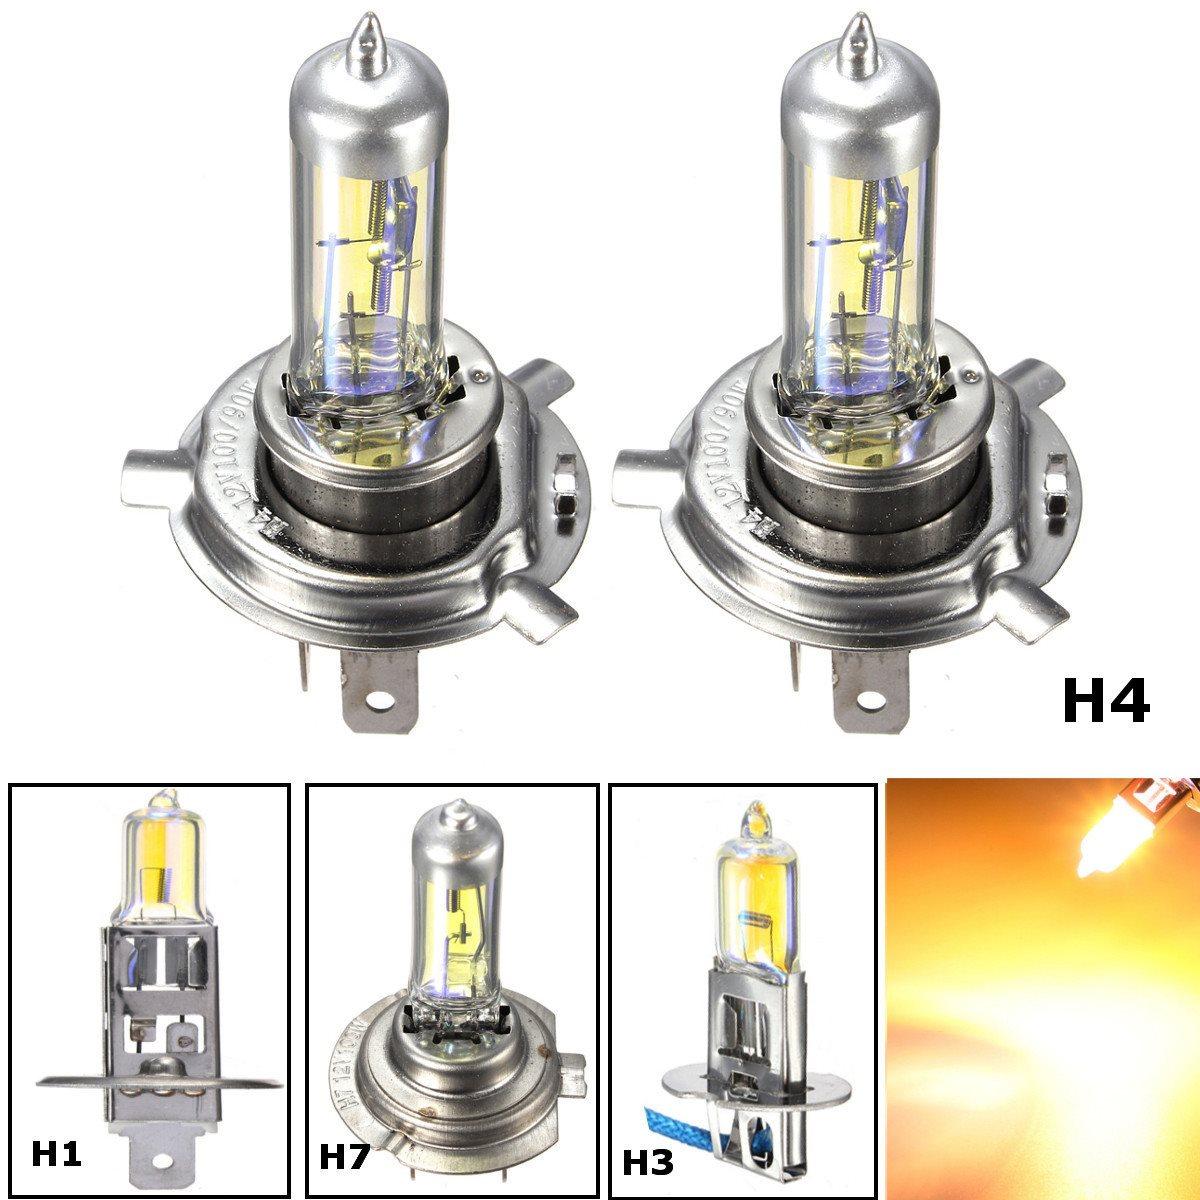 H1 H3 H4 H7 55W Yellow LED Car Light Halogen Lamp Bulb Car Styling HeadLight Lamp Xenon Fog Lights Dipped Beam<br><br>Aliexpress